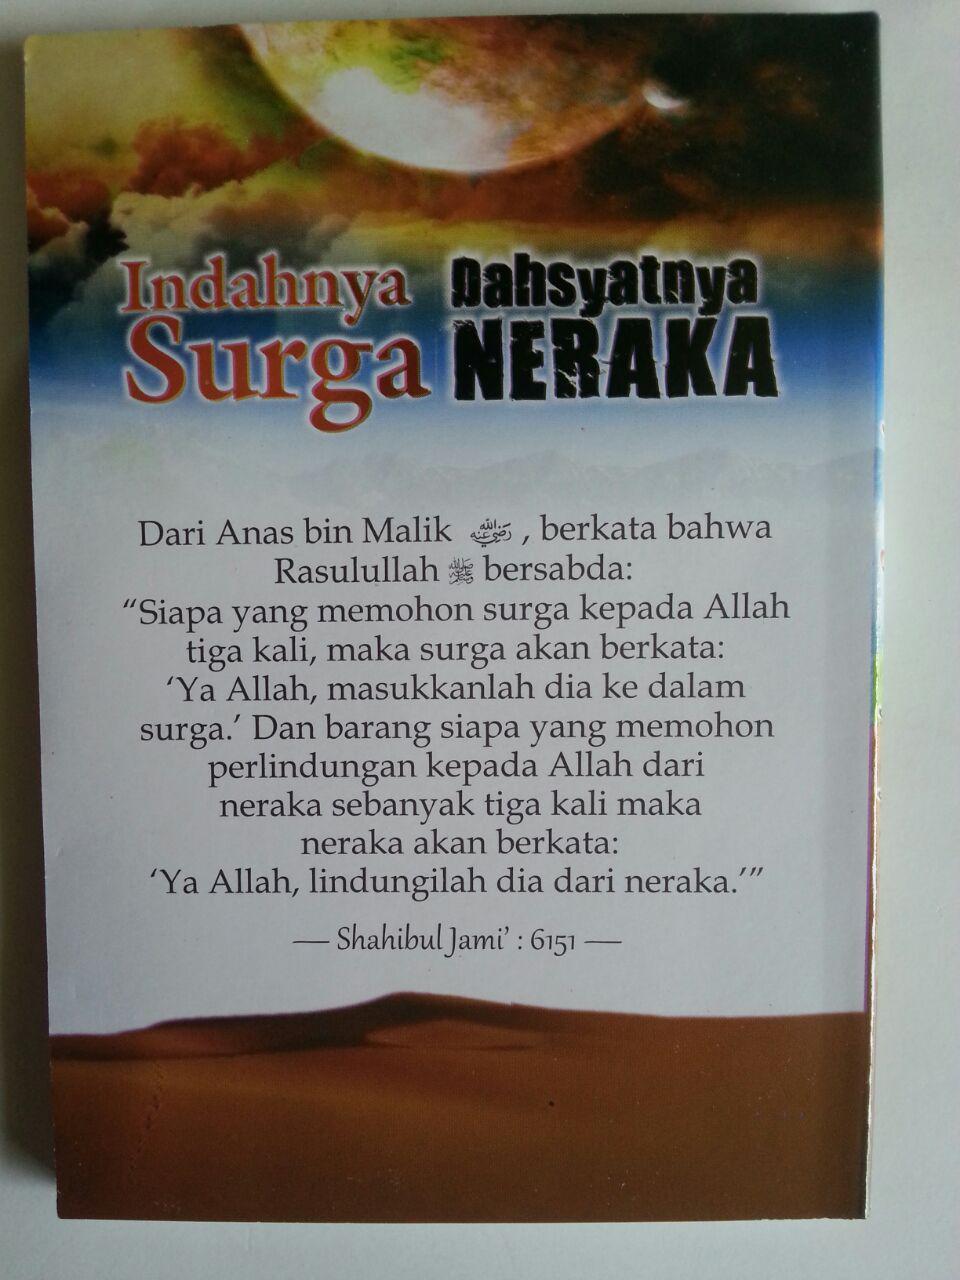 Buku Saku Indahnya Surga Dahsyatnya Neraka cover